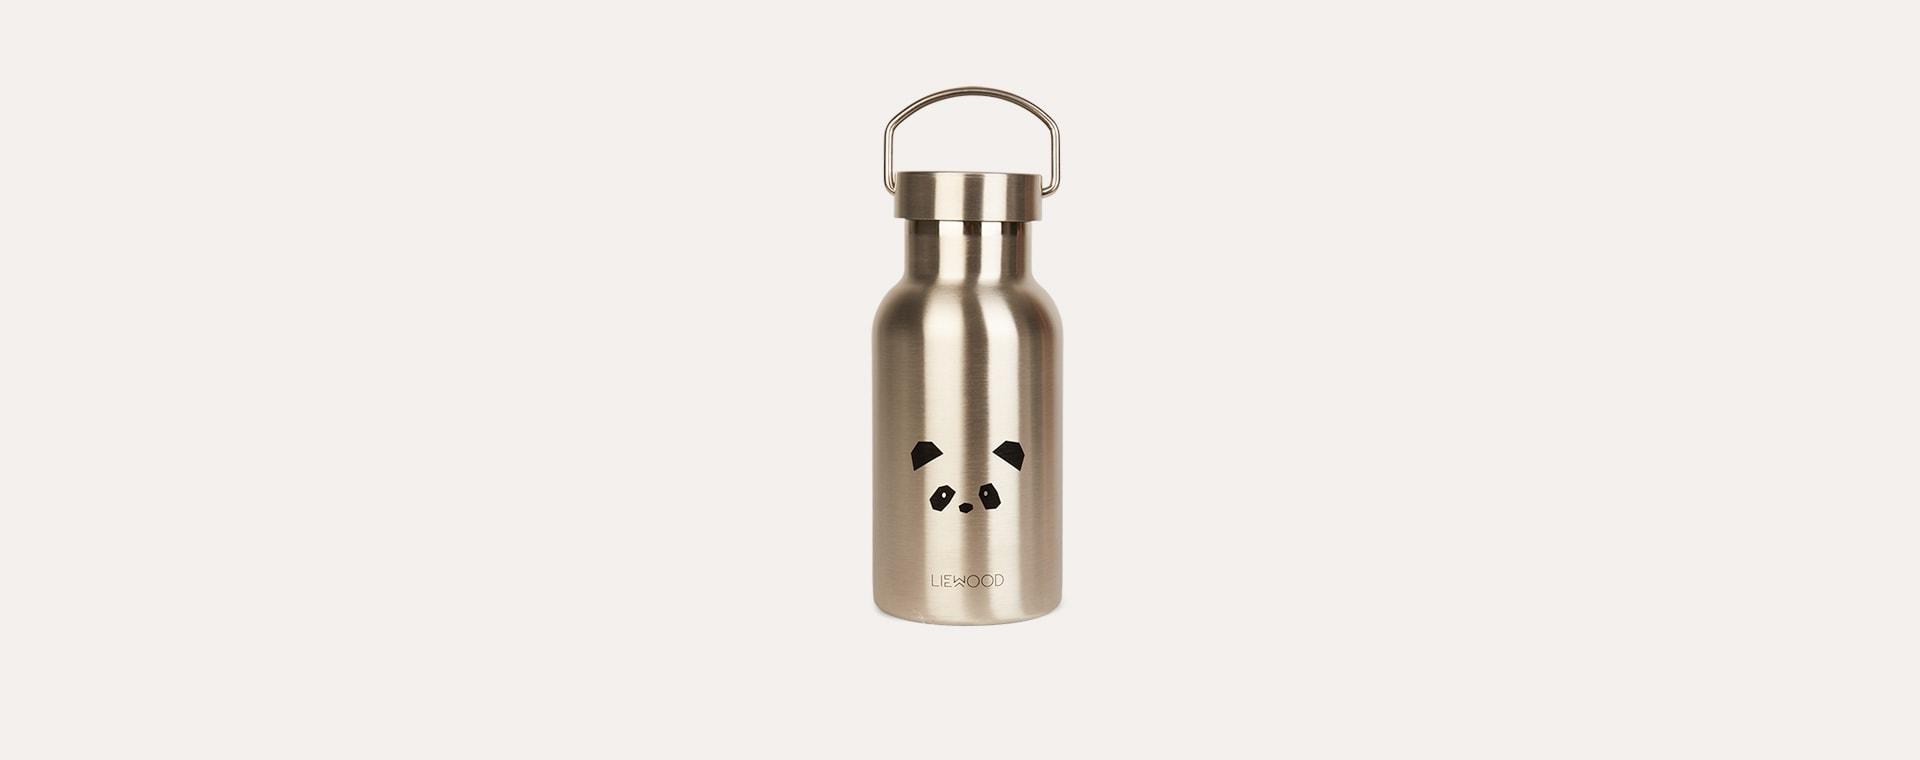 Panda Stainless Steel Liewood Anker Water Bottle